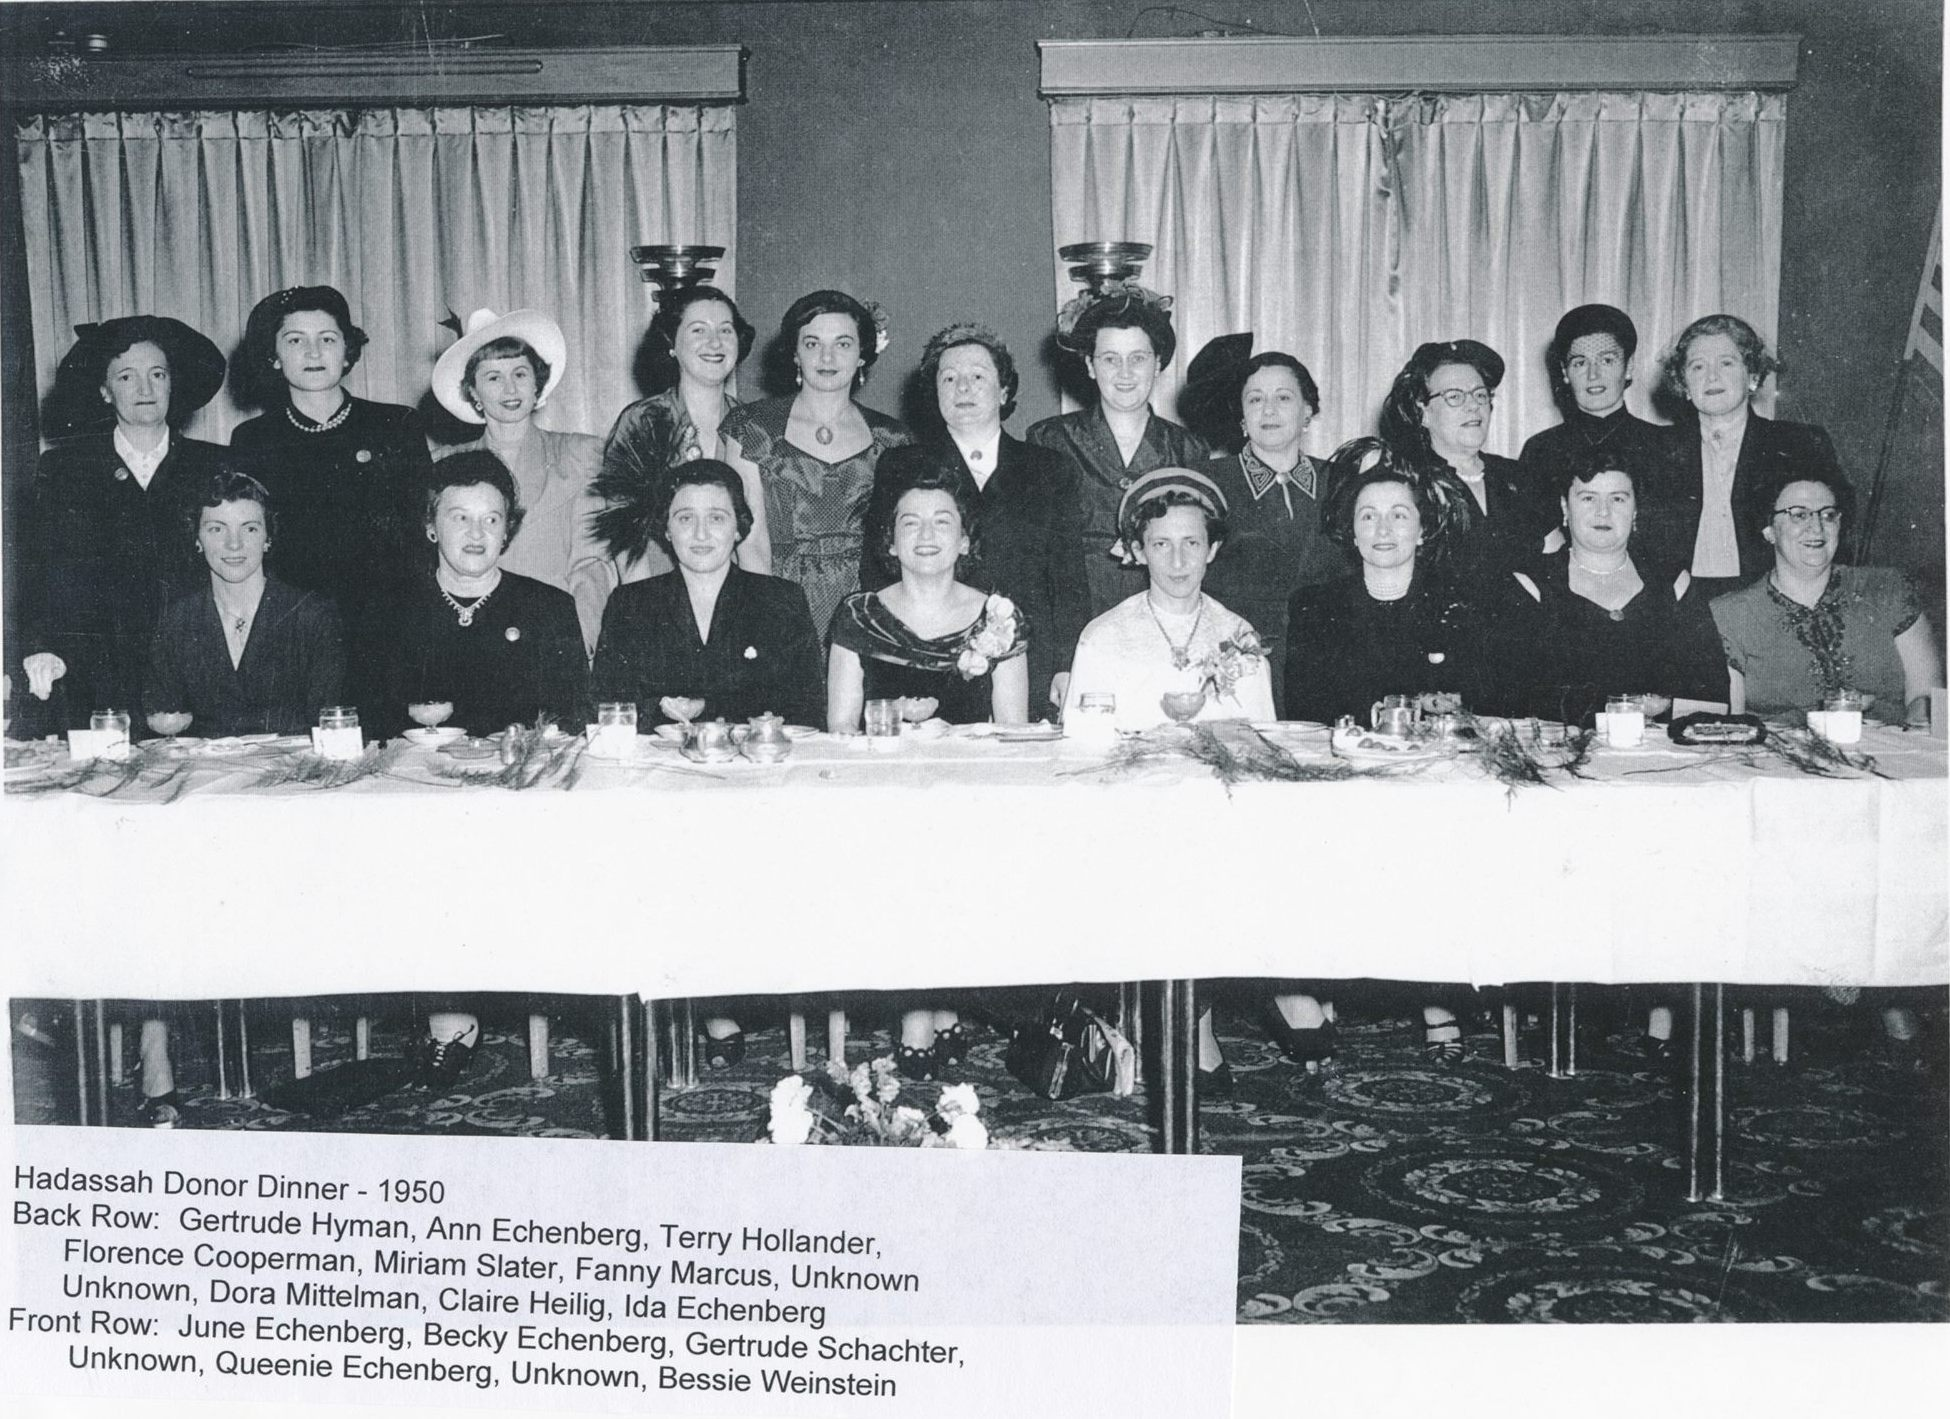 Sherbrooke Hadassah Dinner 1950